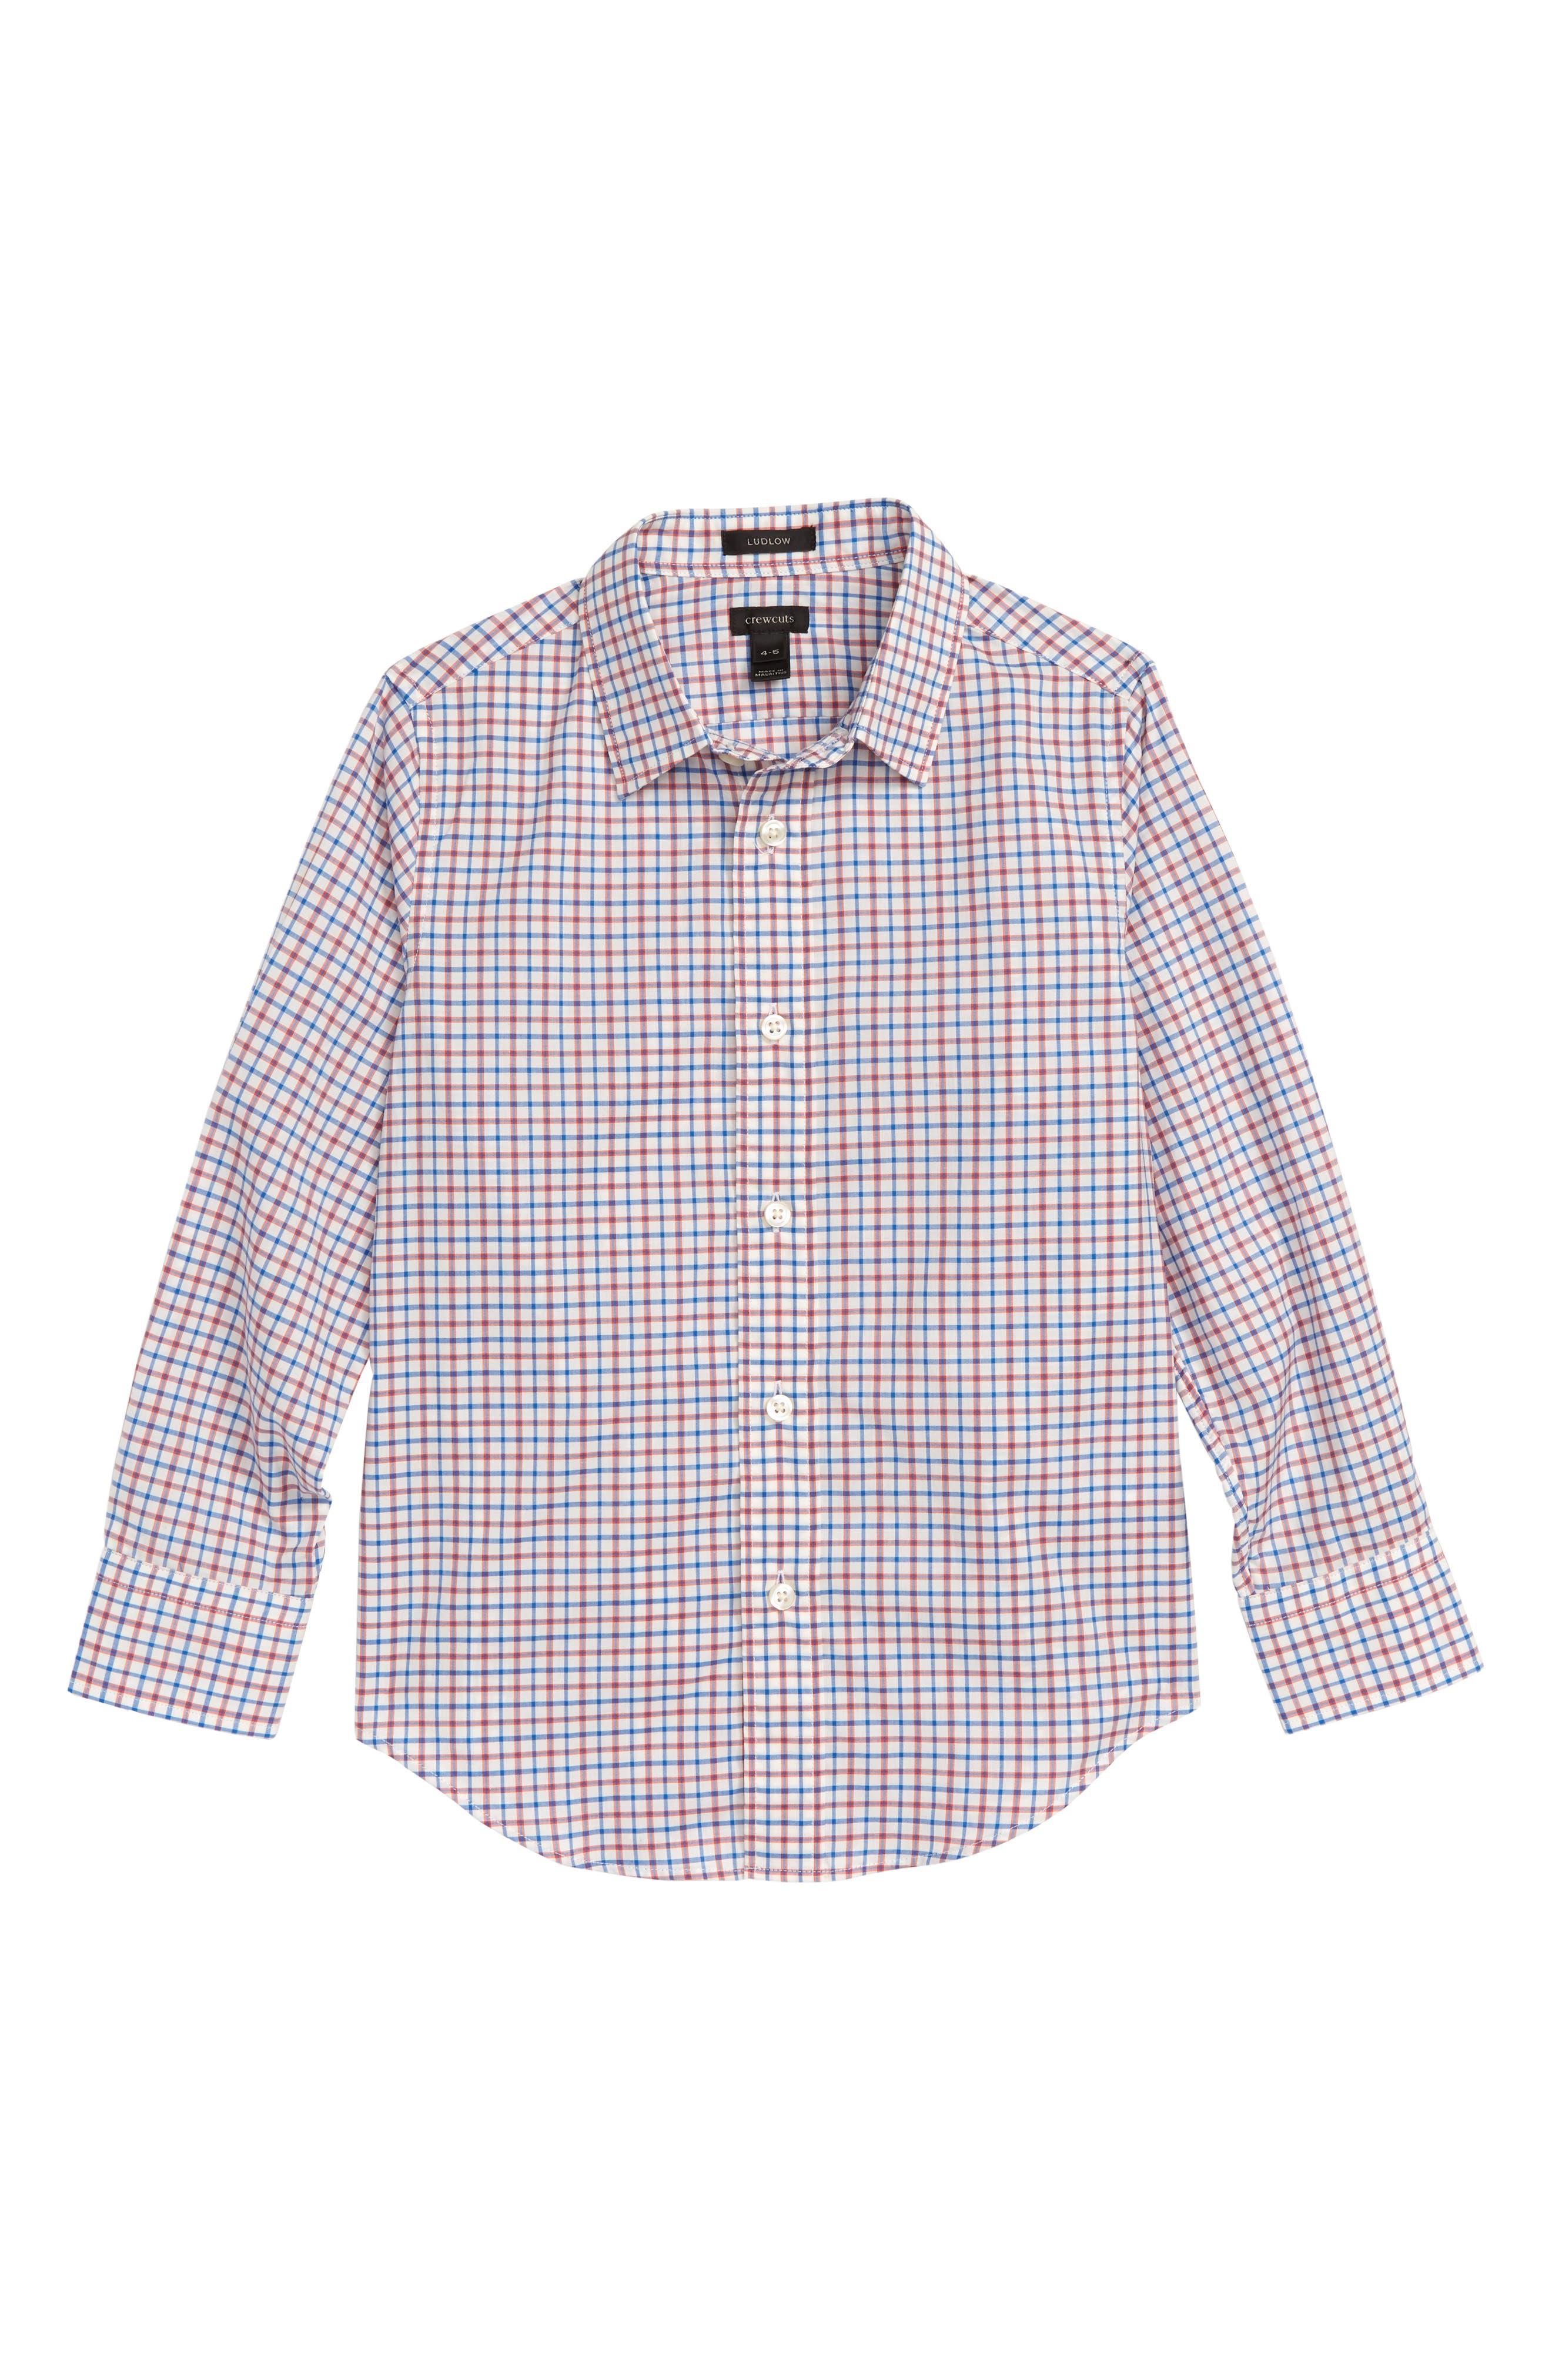 Ludlow Stripe Dress Shirt,                             Main thumbnail 1, color,                             Ivory Poppy